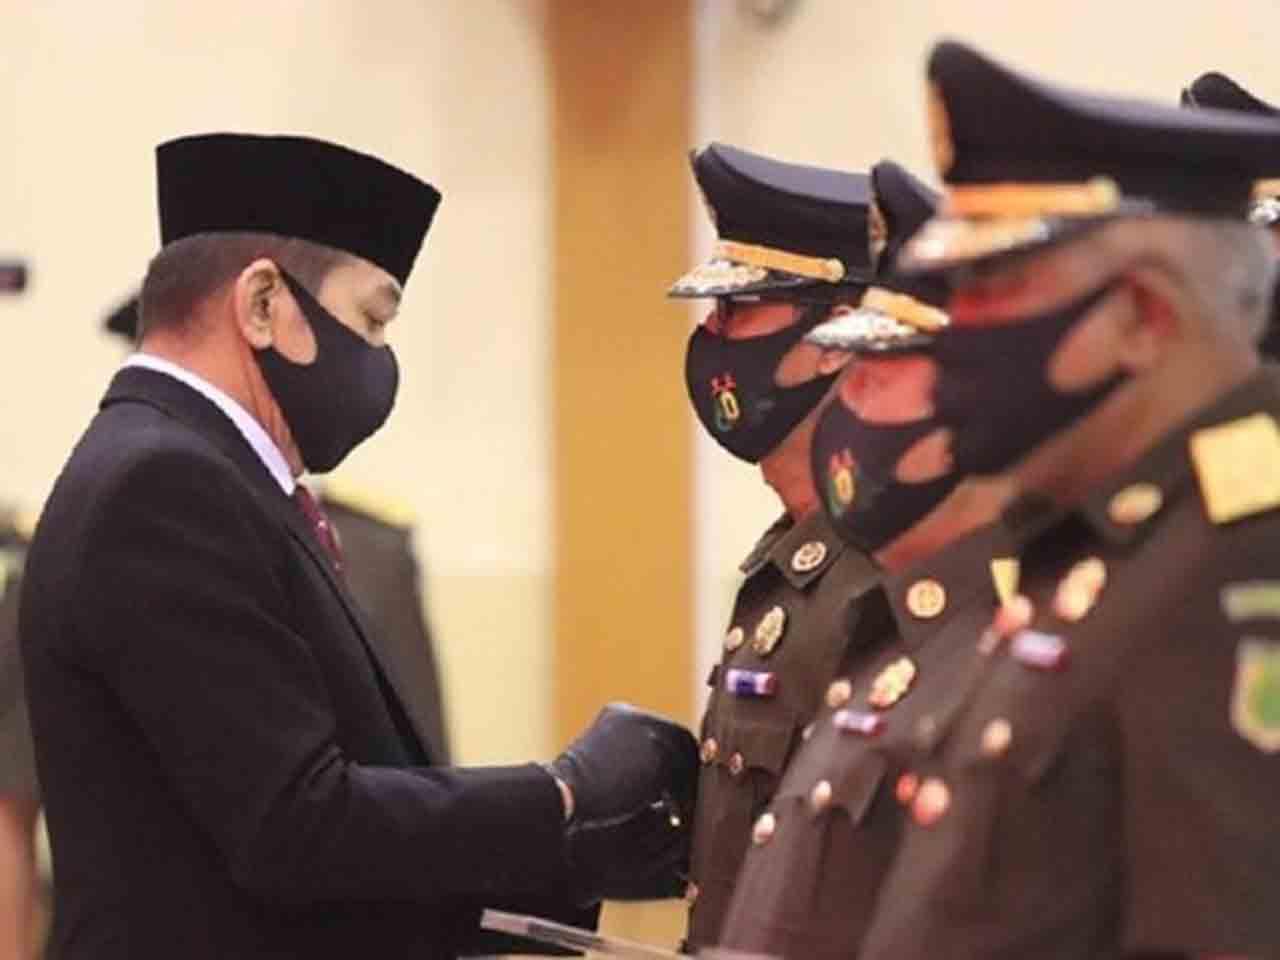 Baharudin Lopa Jaksa Agung Jaksa Agung Lantik Zega Jadi Kajati Maluku Malukuterkini Com